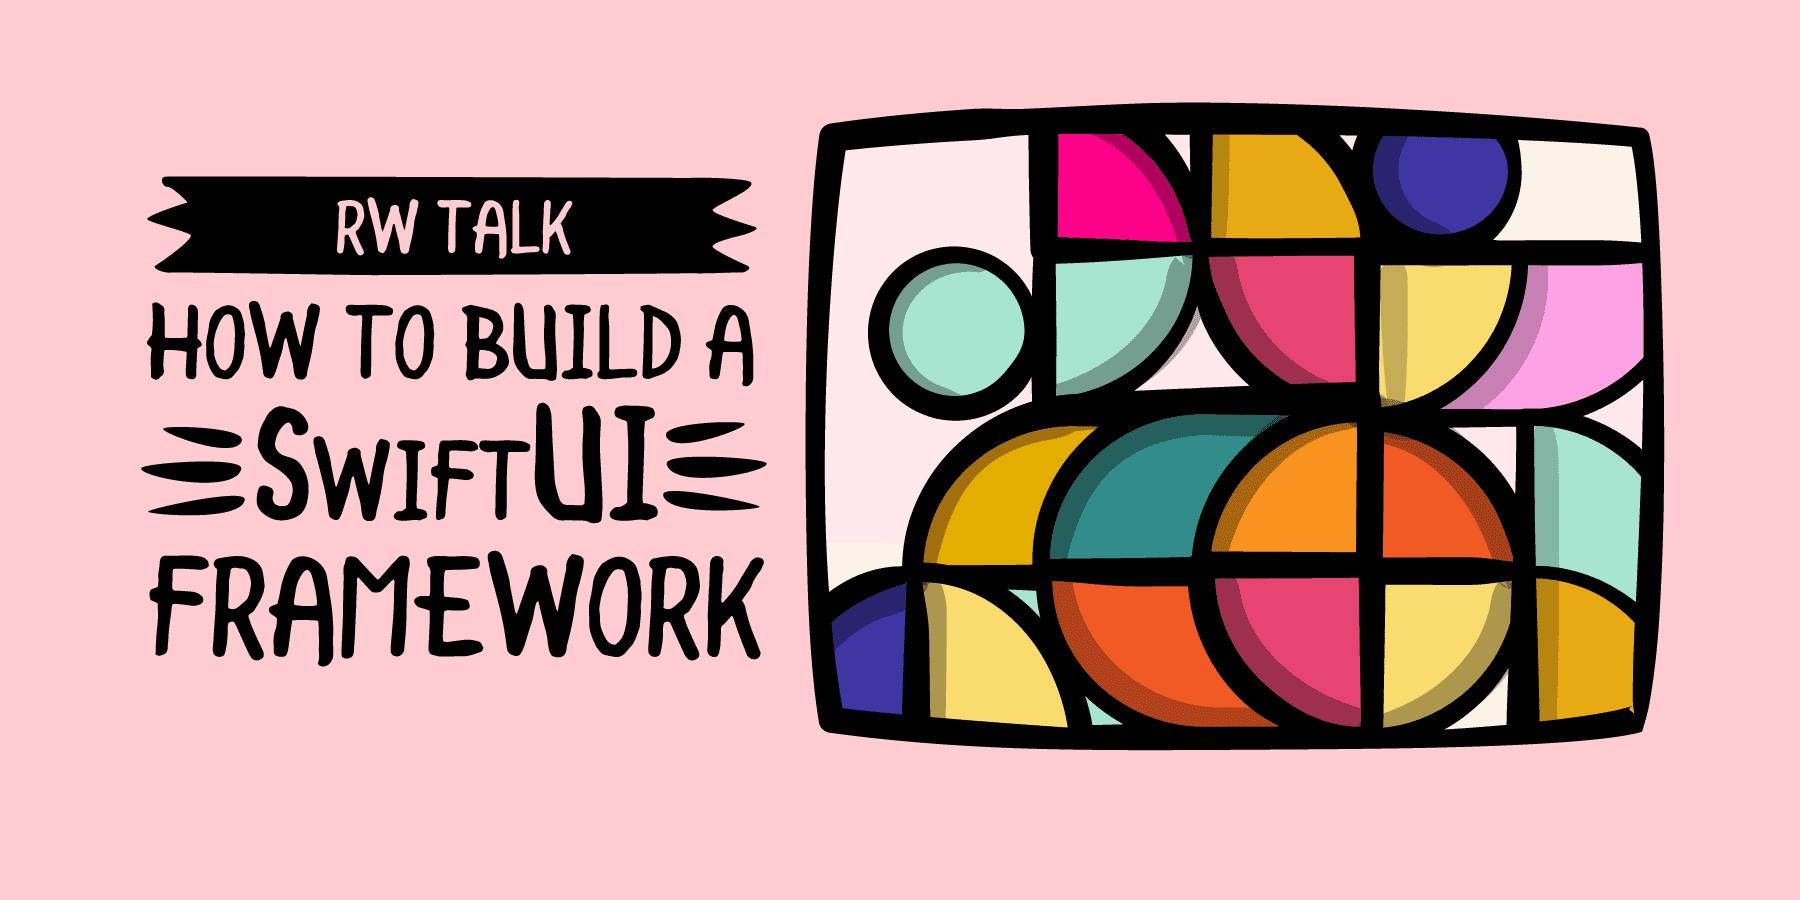 David Okun: How To Build a SwiftUI Framework [FREE]